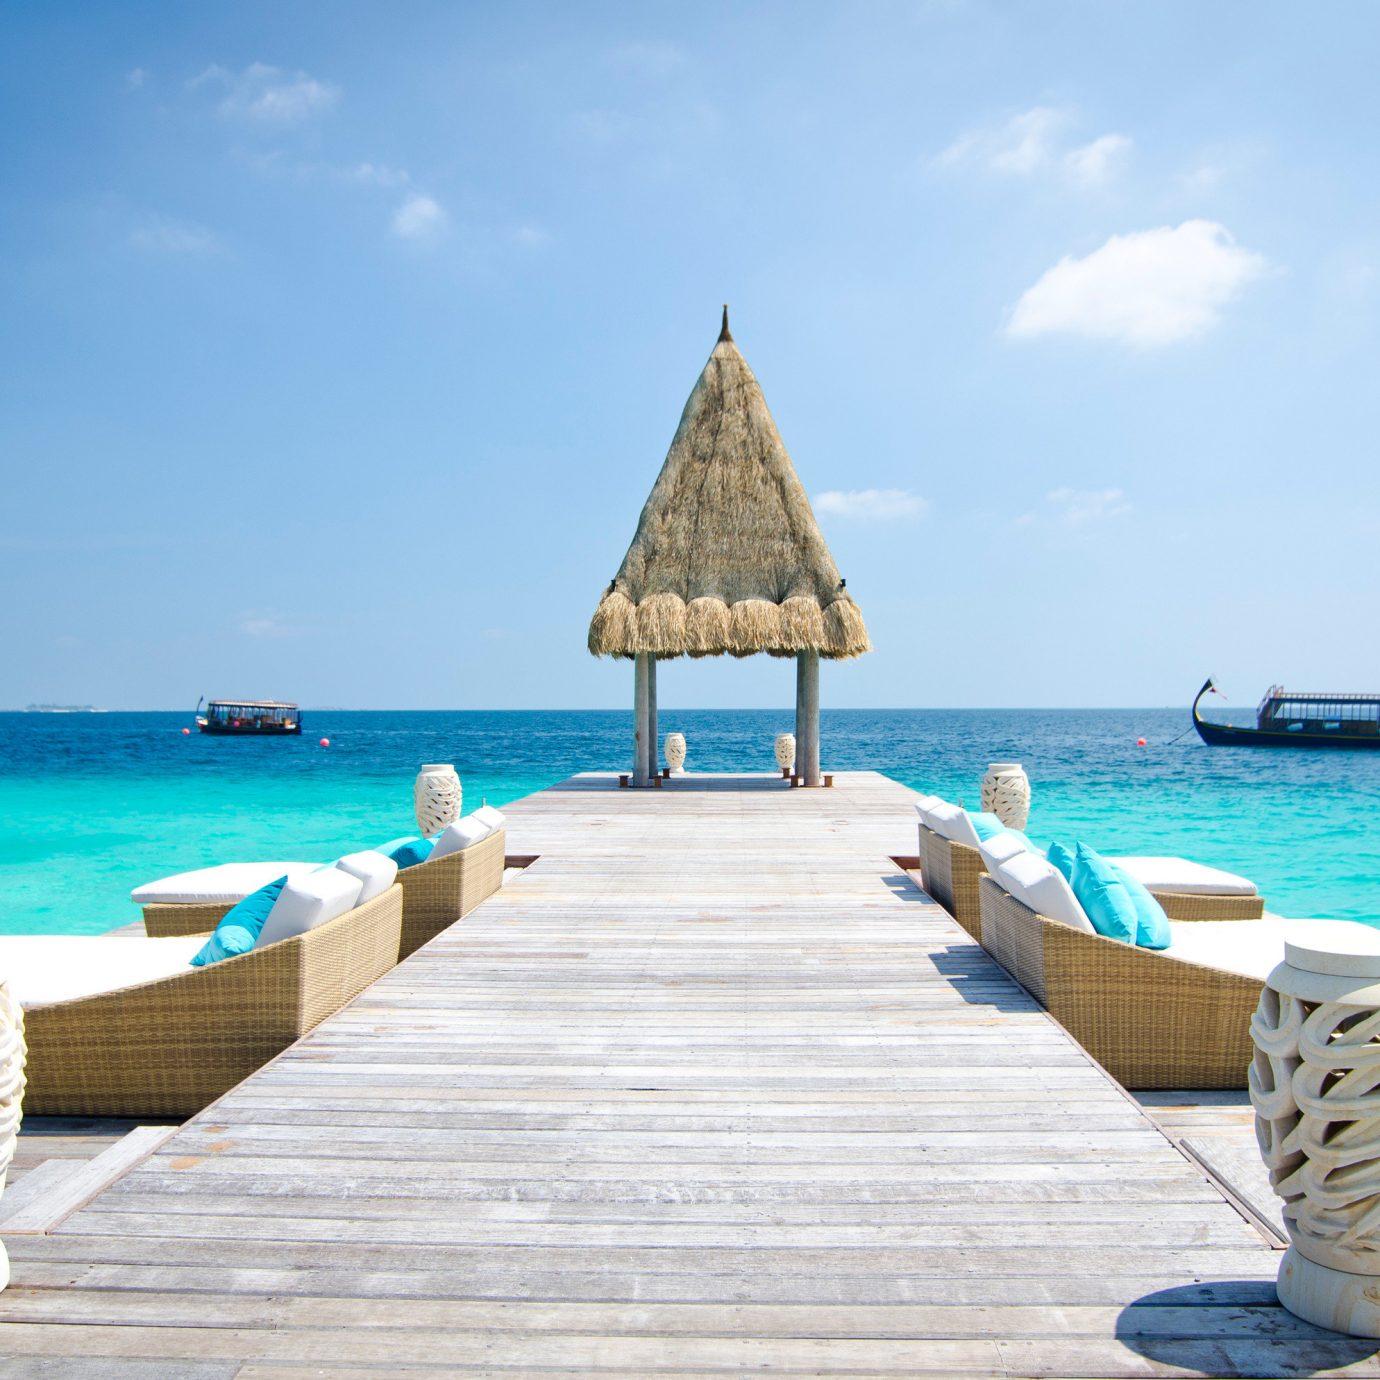 Hotels sky water ground Sea Beach leisure chair outdoor shore vacation horizon Ocean caribbean Coast bay Island sand Lagoon Resort cape facing day